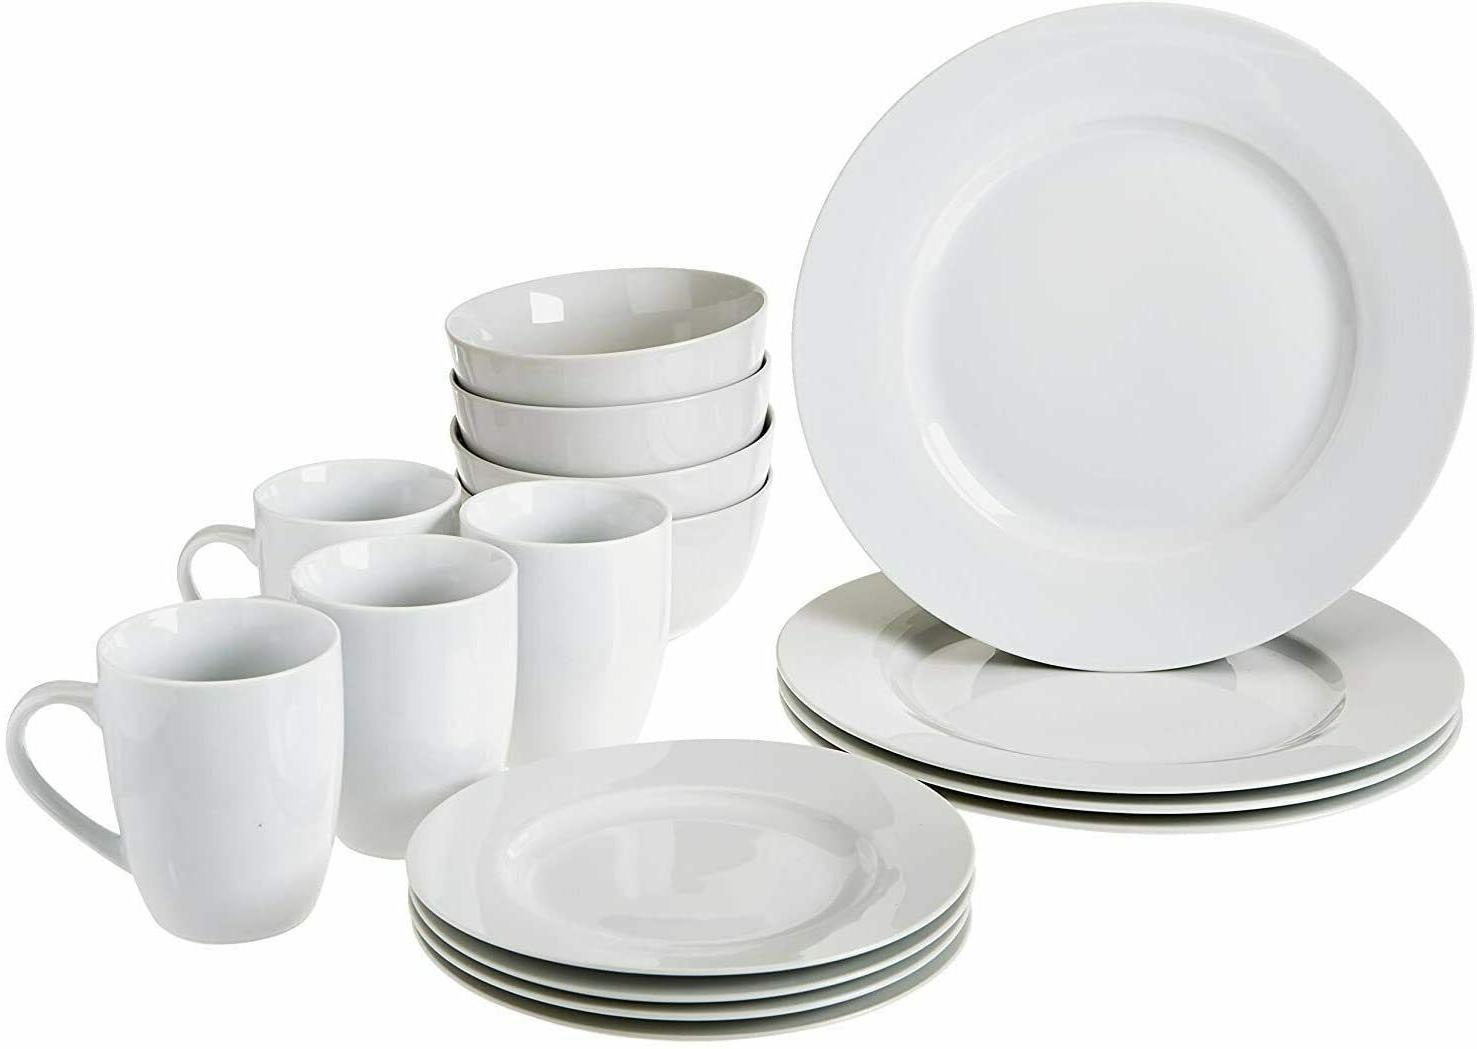 16 piece dinnerware set plates bowls mugs